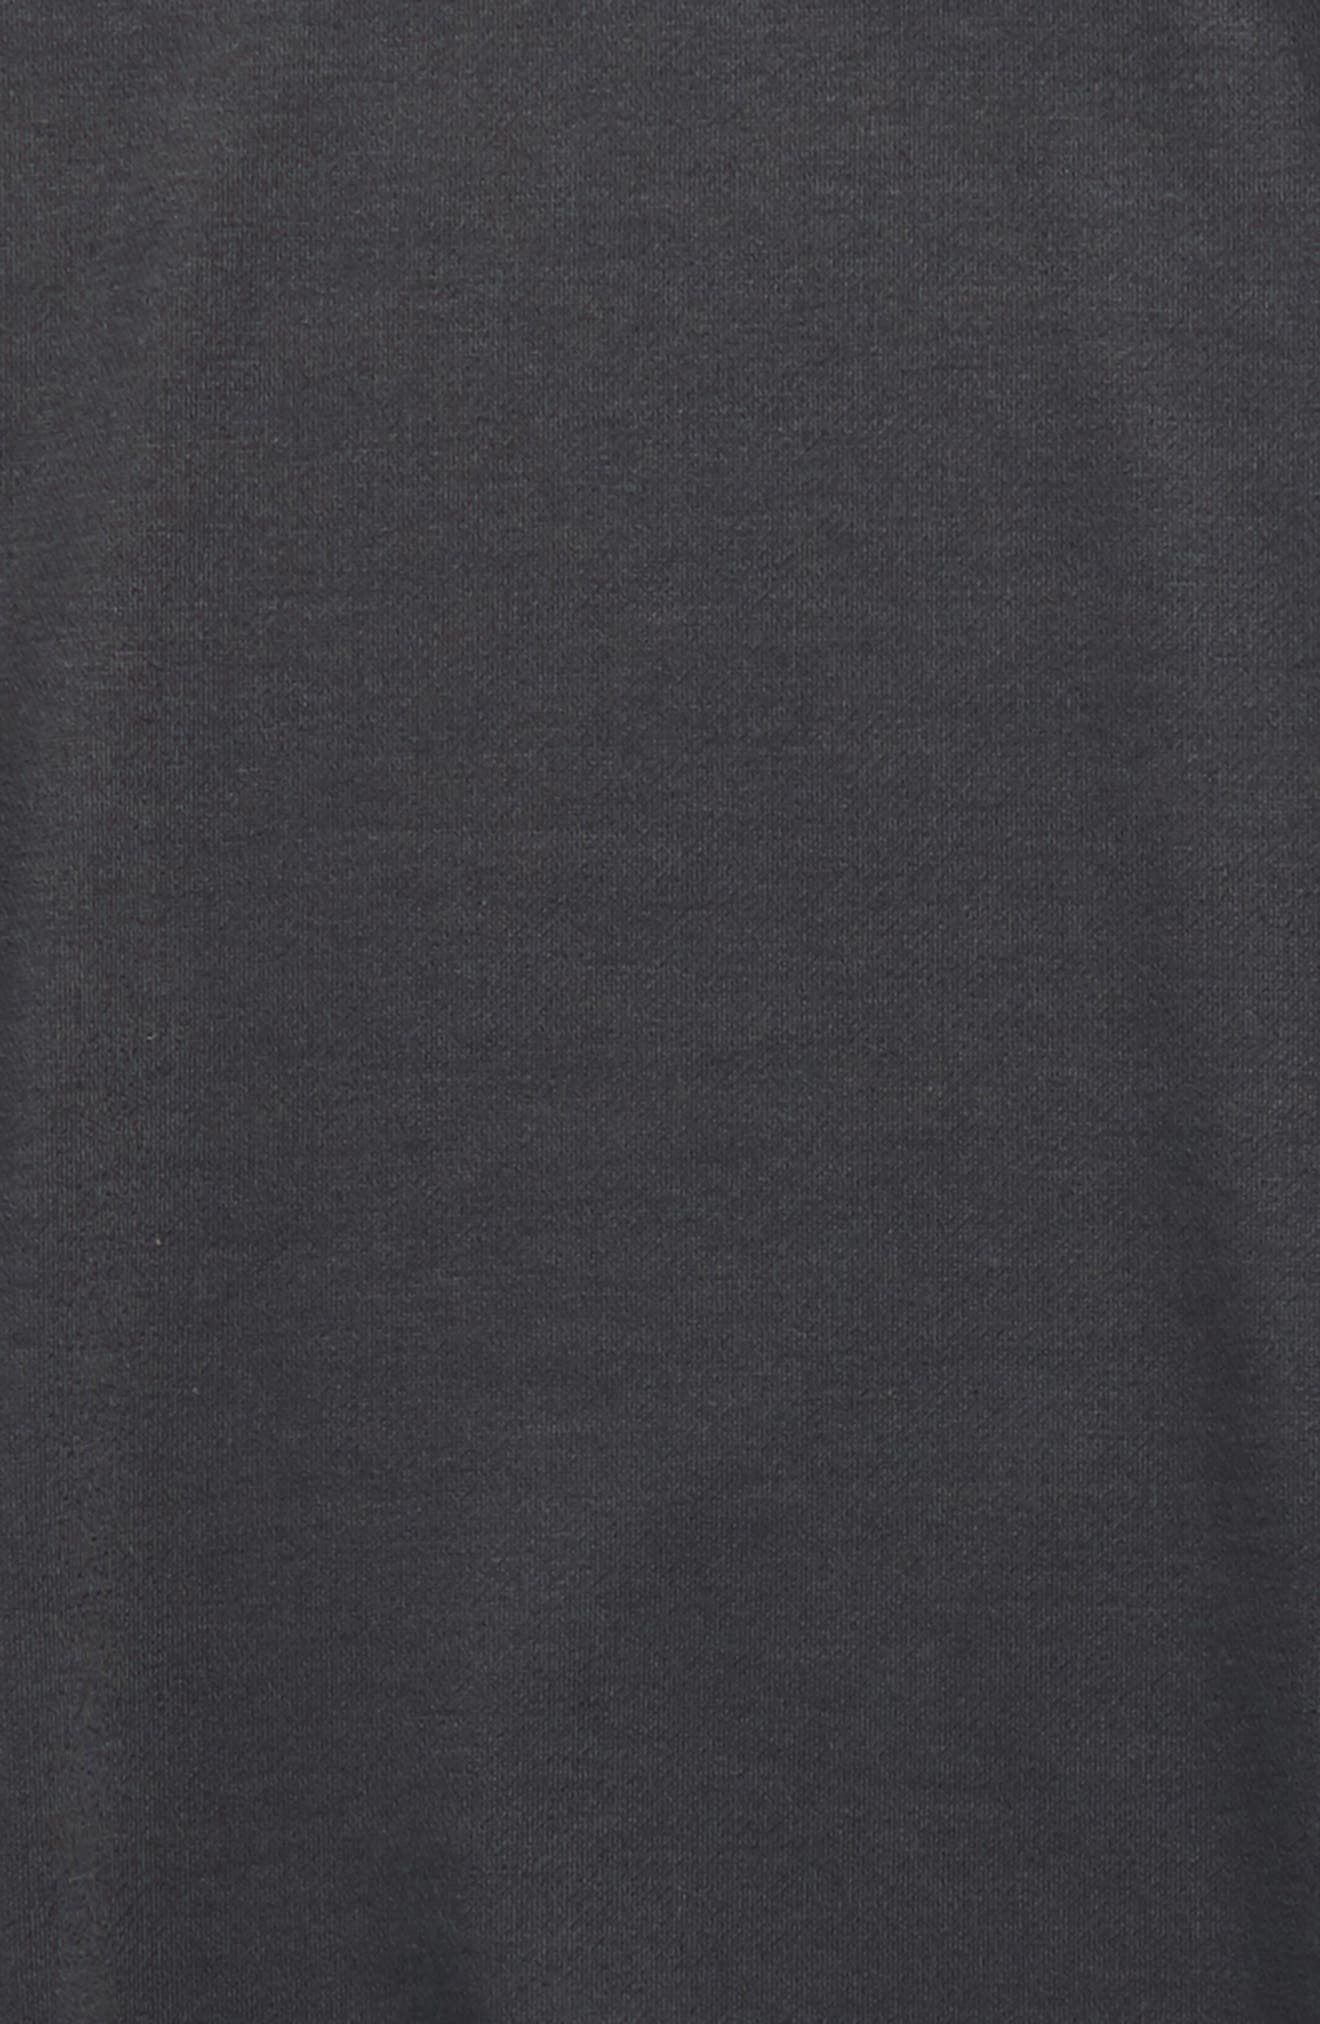 Alternate Image 2  - Soprano Side Lace Sweatshirt (Big Girls)